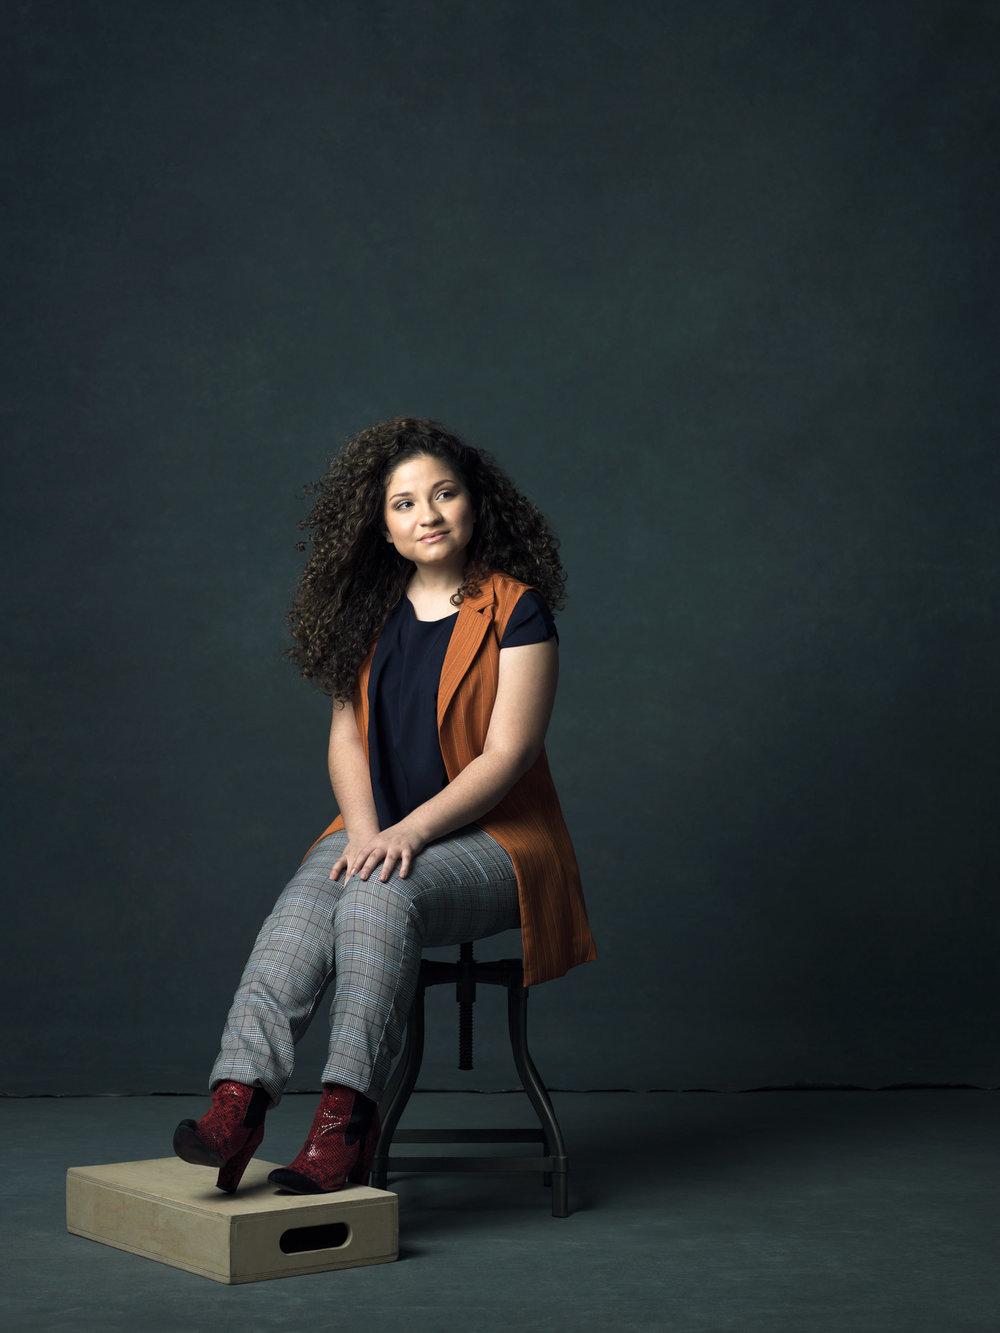 The Image Creator Woman - Karla Diaz in the Zinnia Blouse.